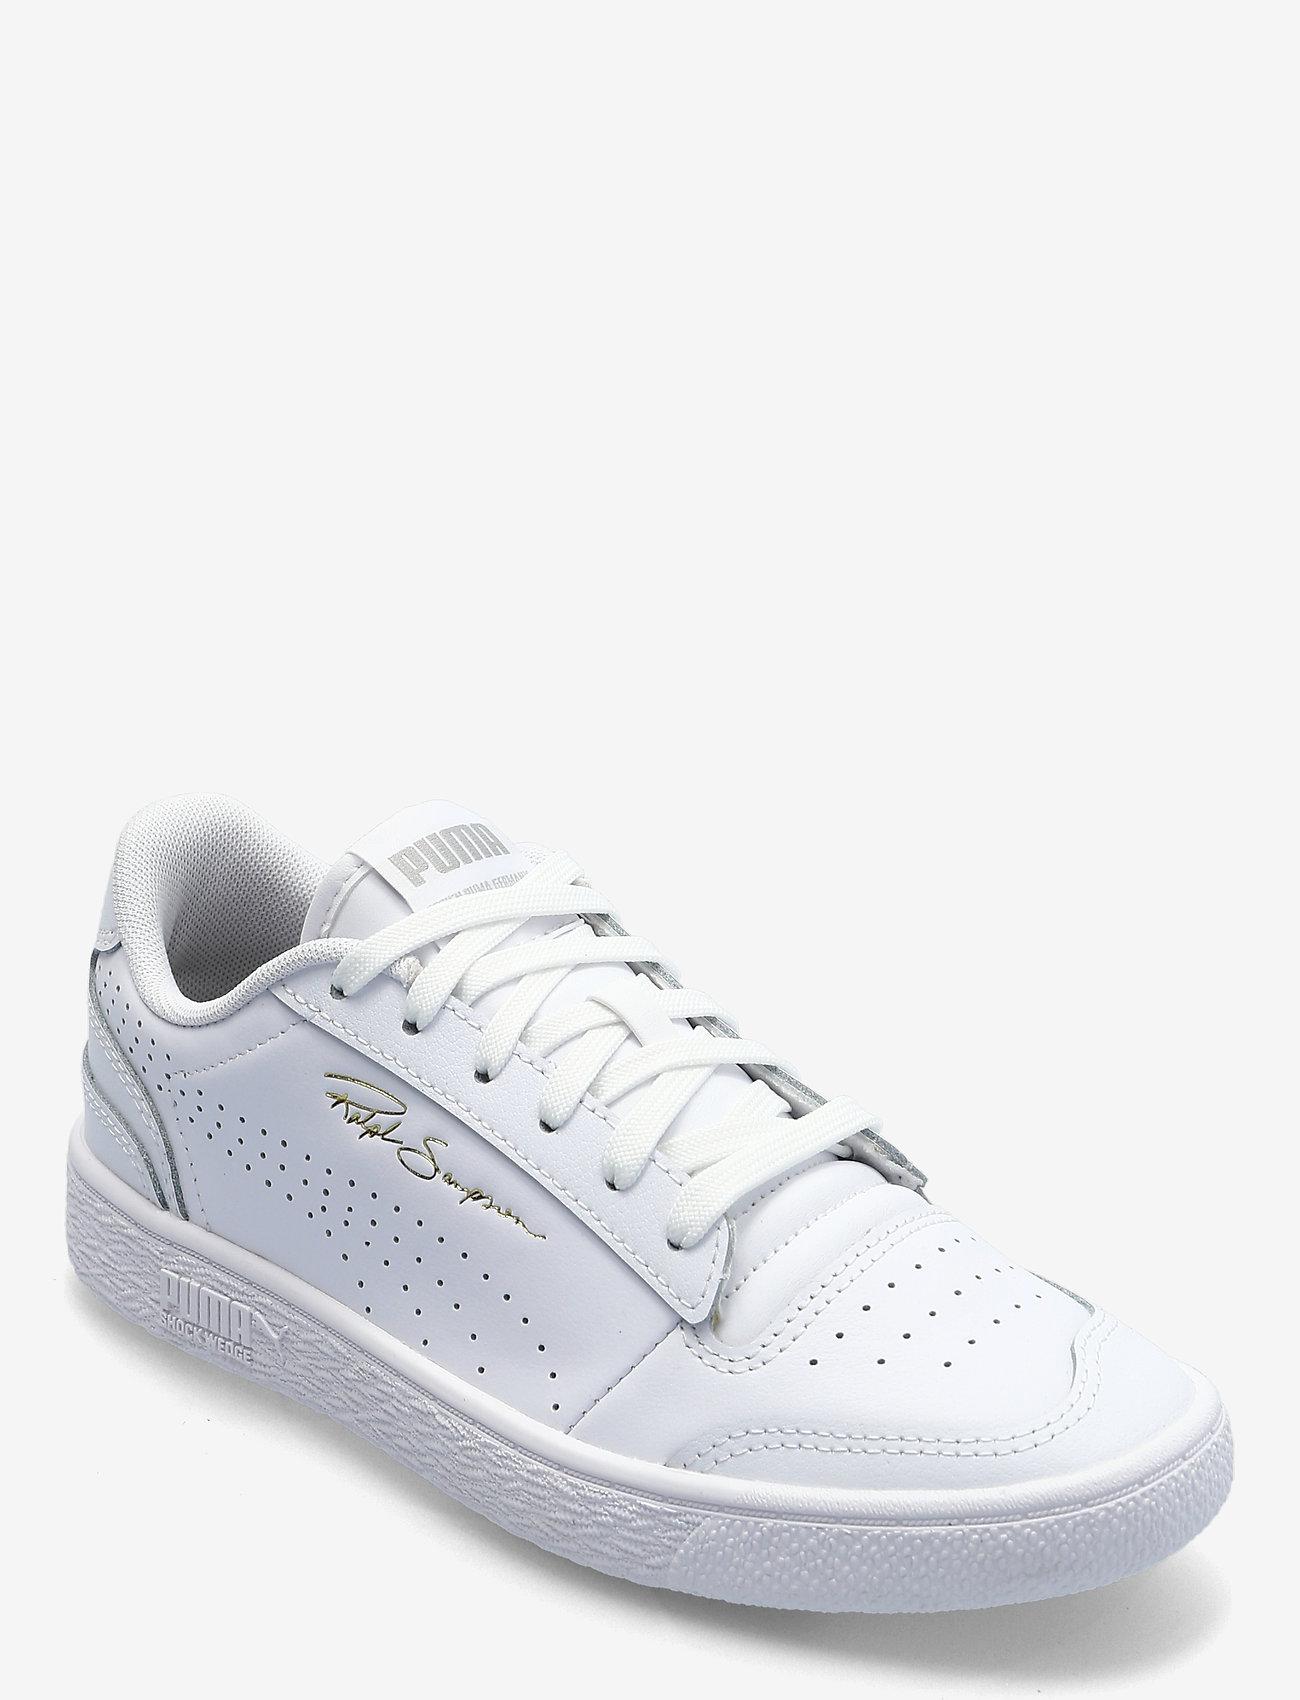 PUMA Ralph Sampson Lo Perf - Sneakers | Boozt.com